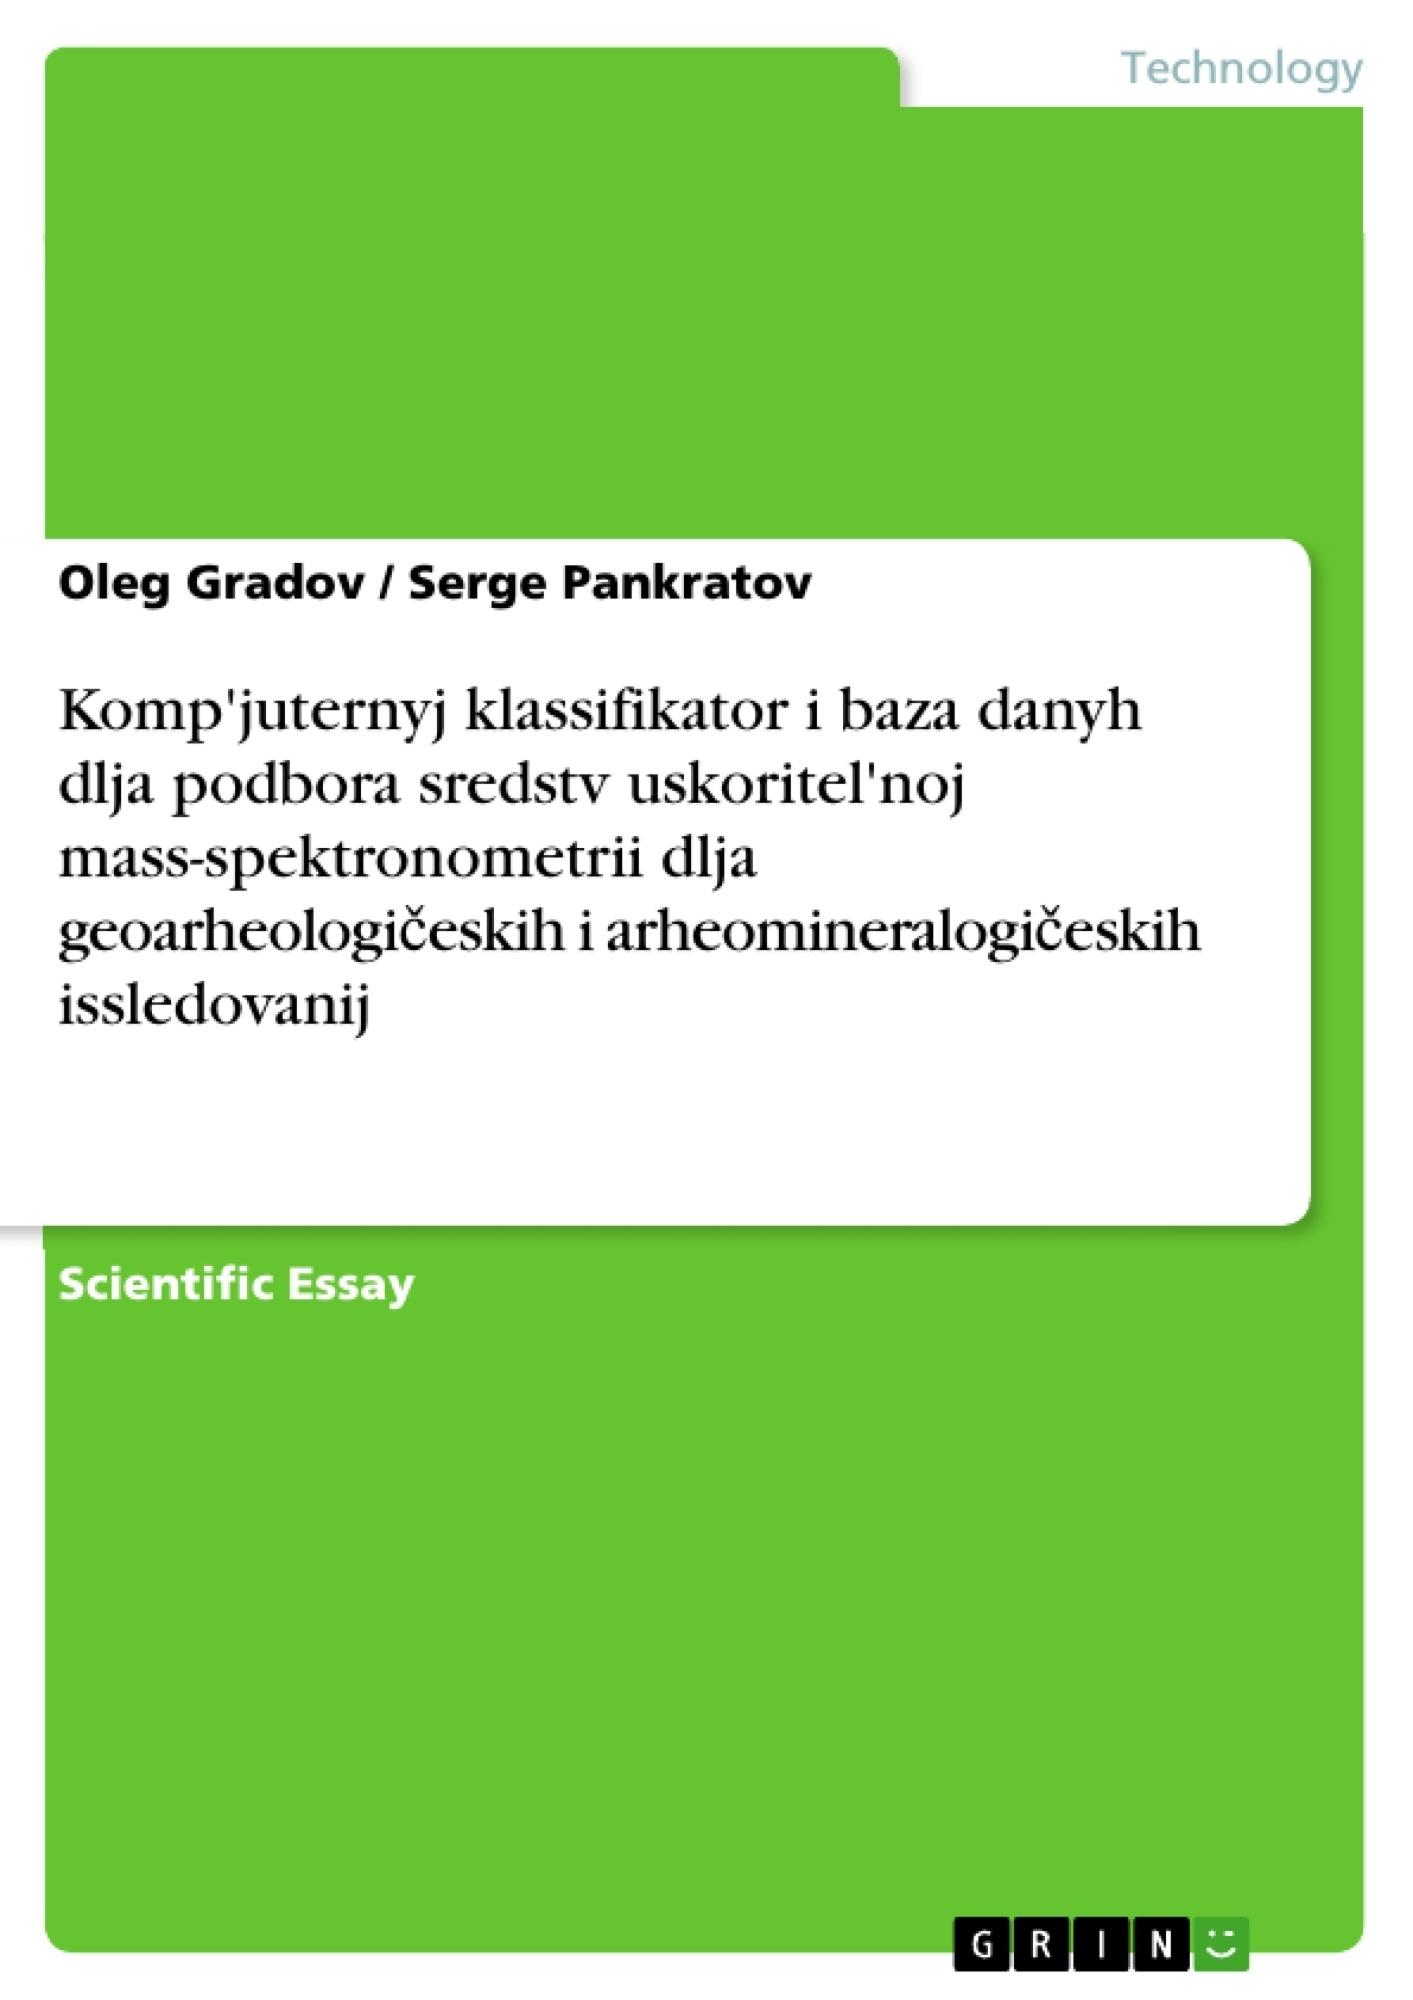 Title: Komp'juternyj klassifikator i baza danyh dlja podbora sredstv uskoritel'noj mass-spektronometrii dlja geoarheologičeskih i arheomineralogičeskih issledovanij